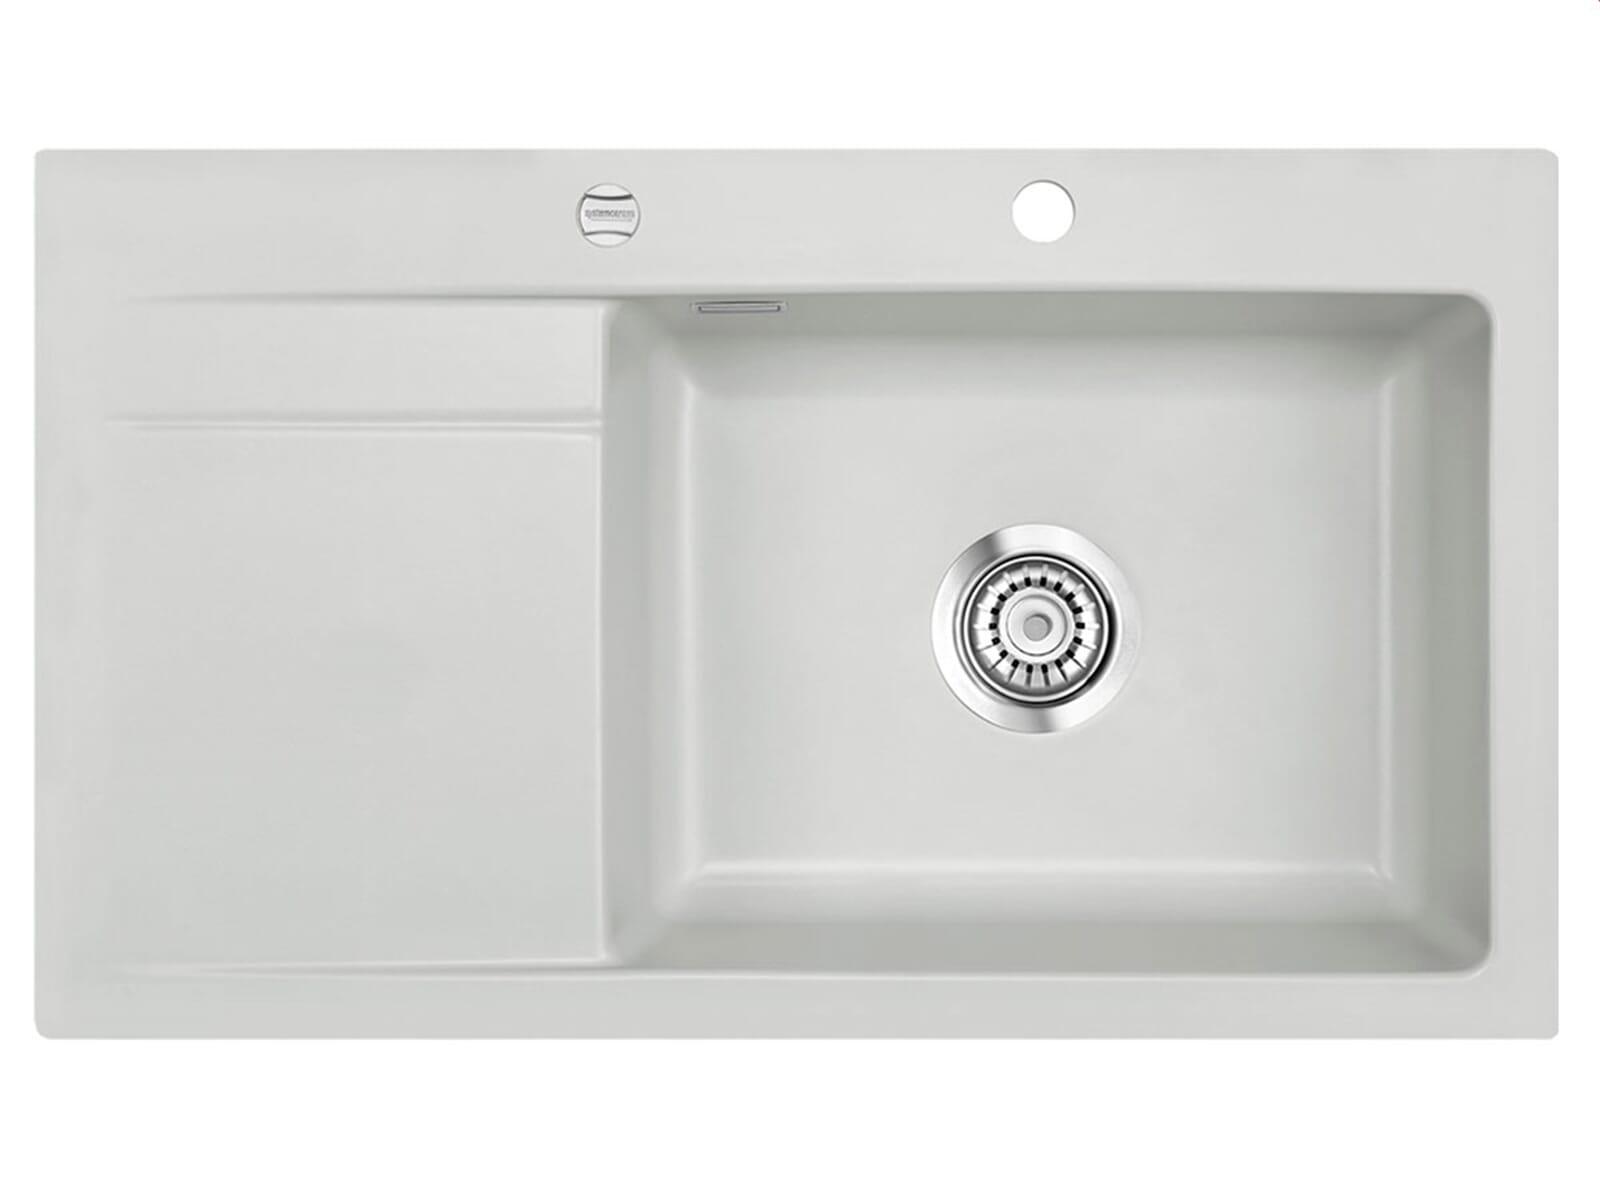 Systemceram Stema 86 SL Alu Keramikspüle Excenterbetätigung